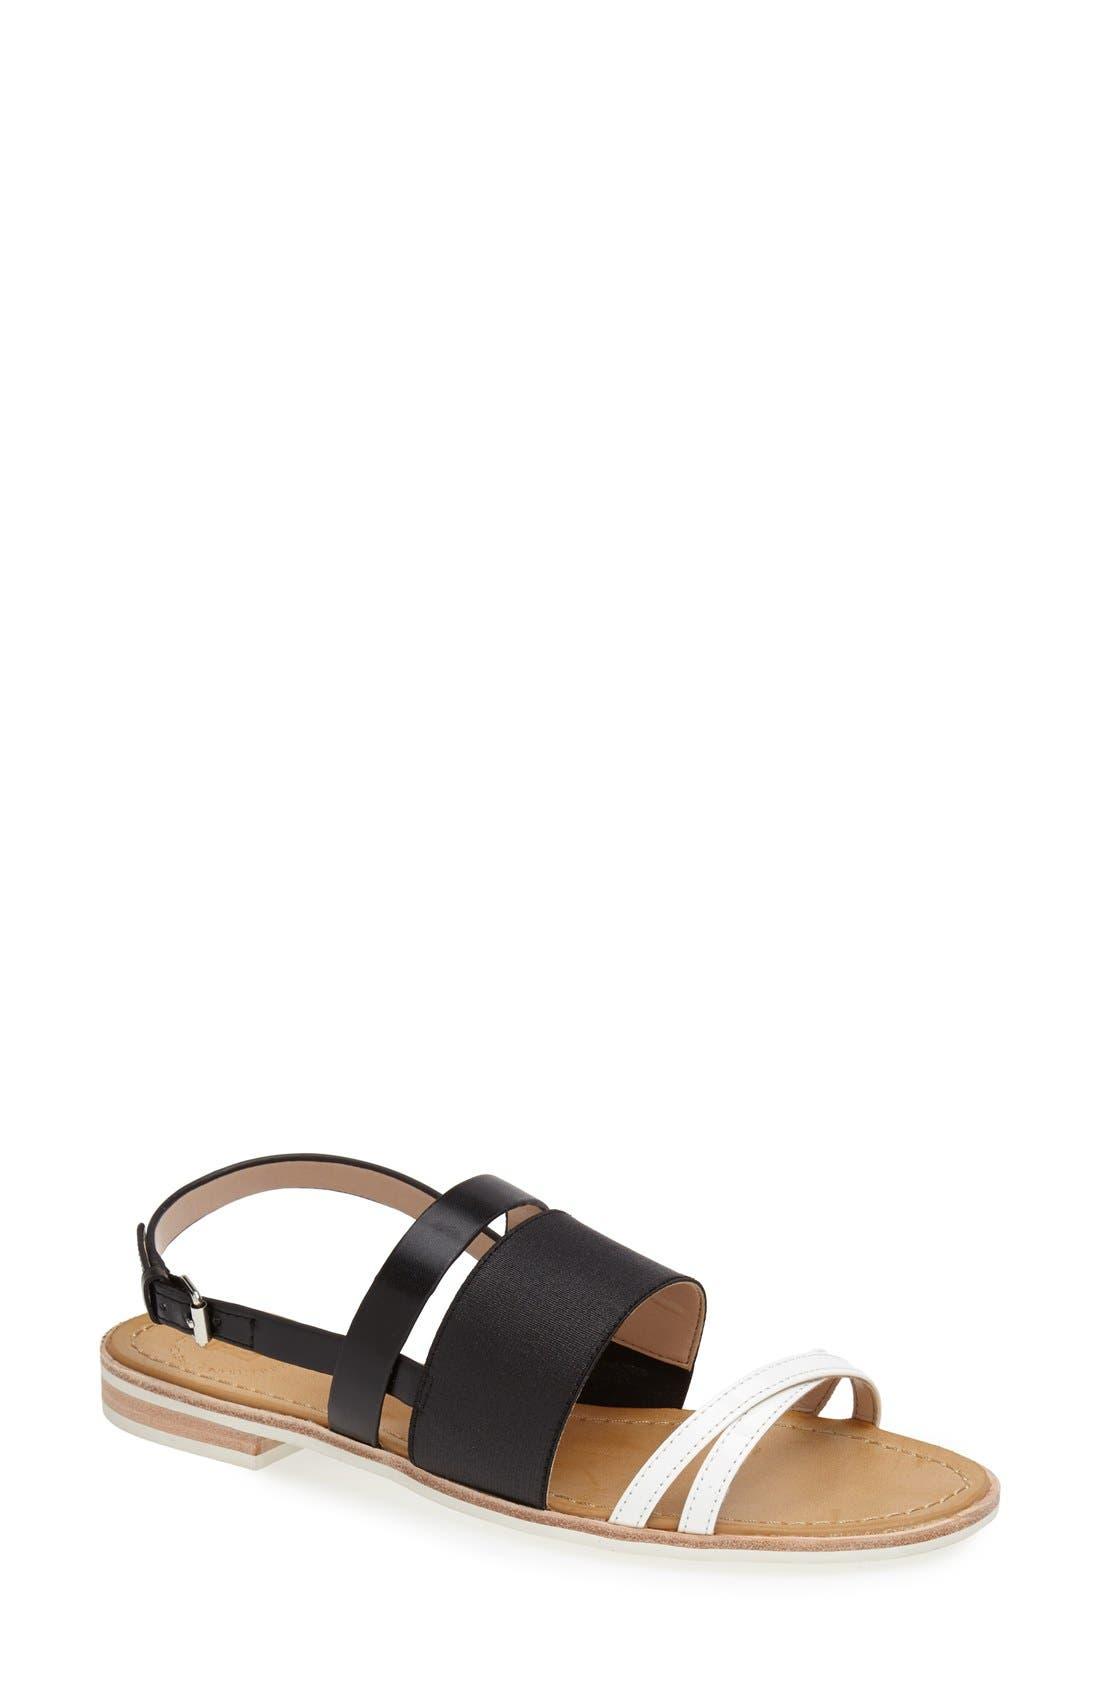 'Hallie' Sandal, Main, color, 015